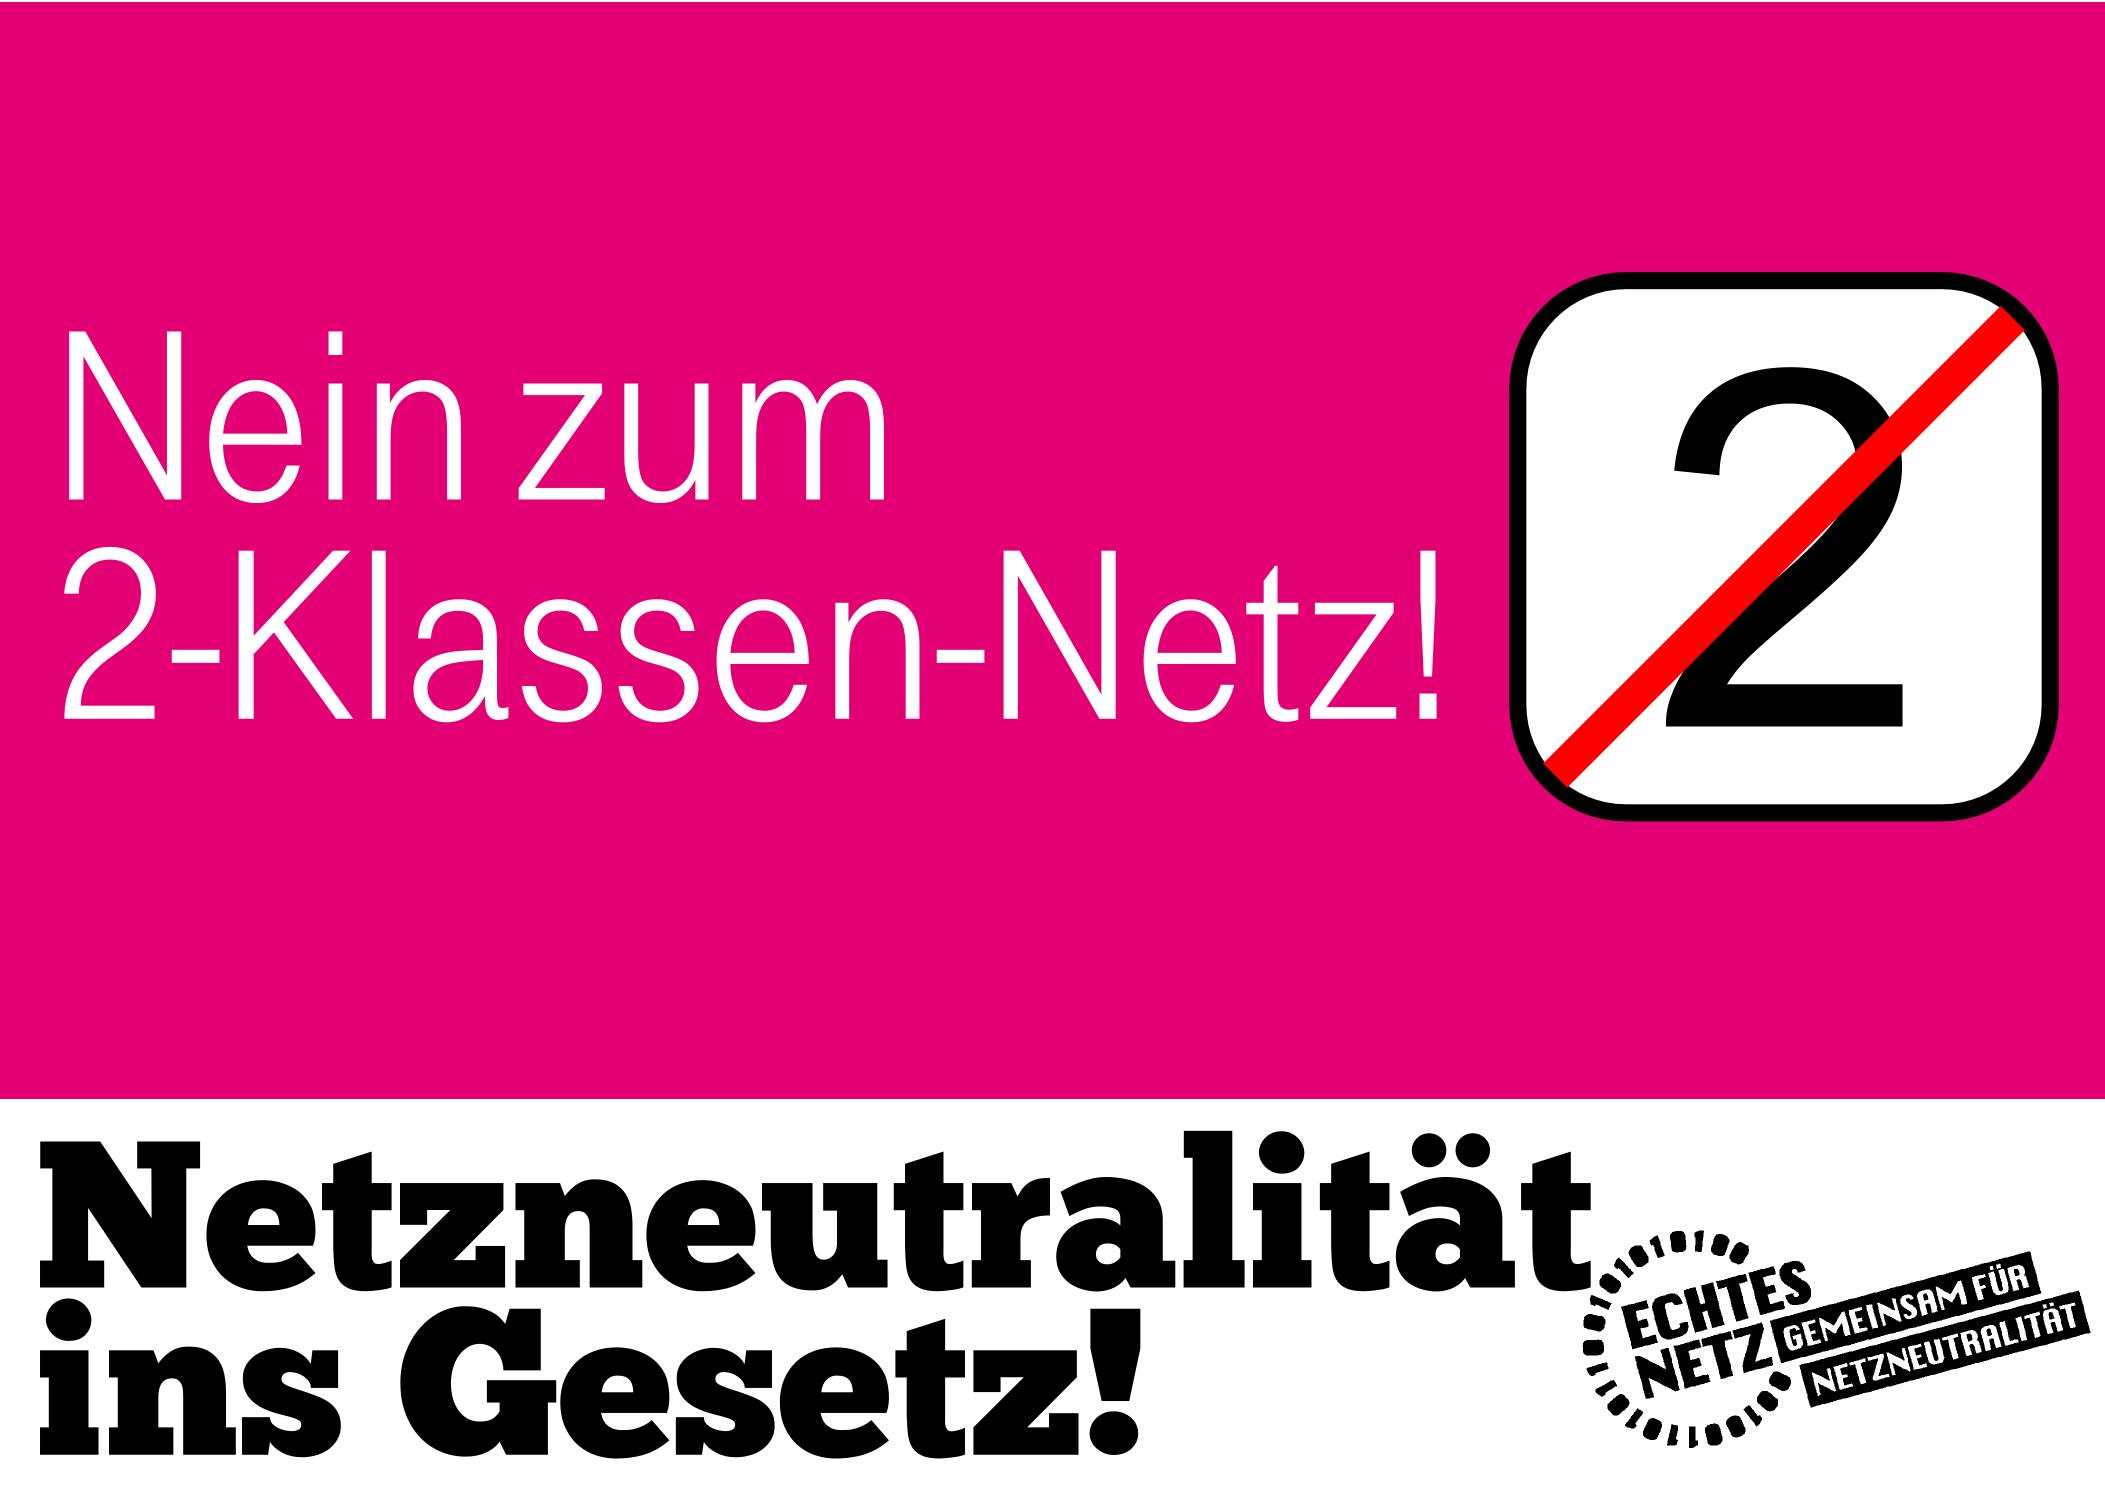 Netzneutralität: Bundestags-Anhörung im Juni – Pläne der EU